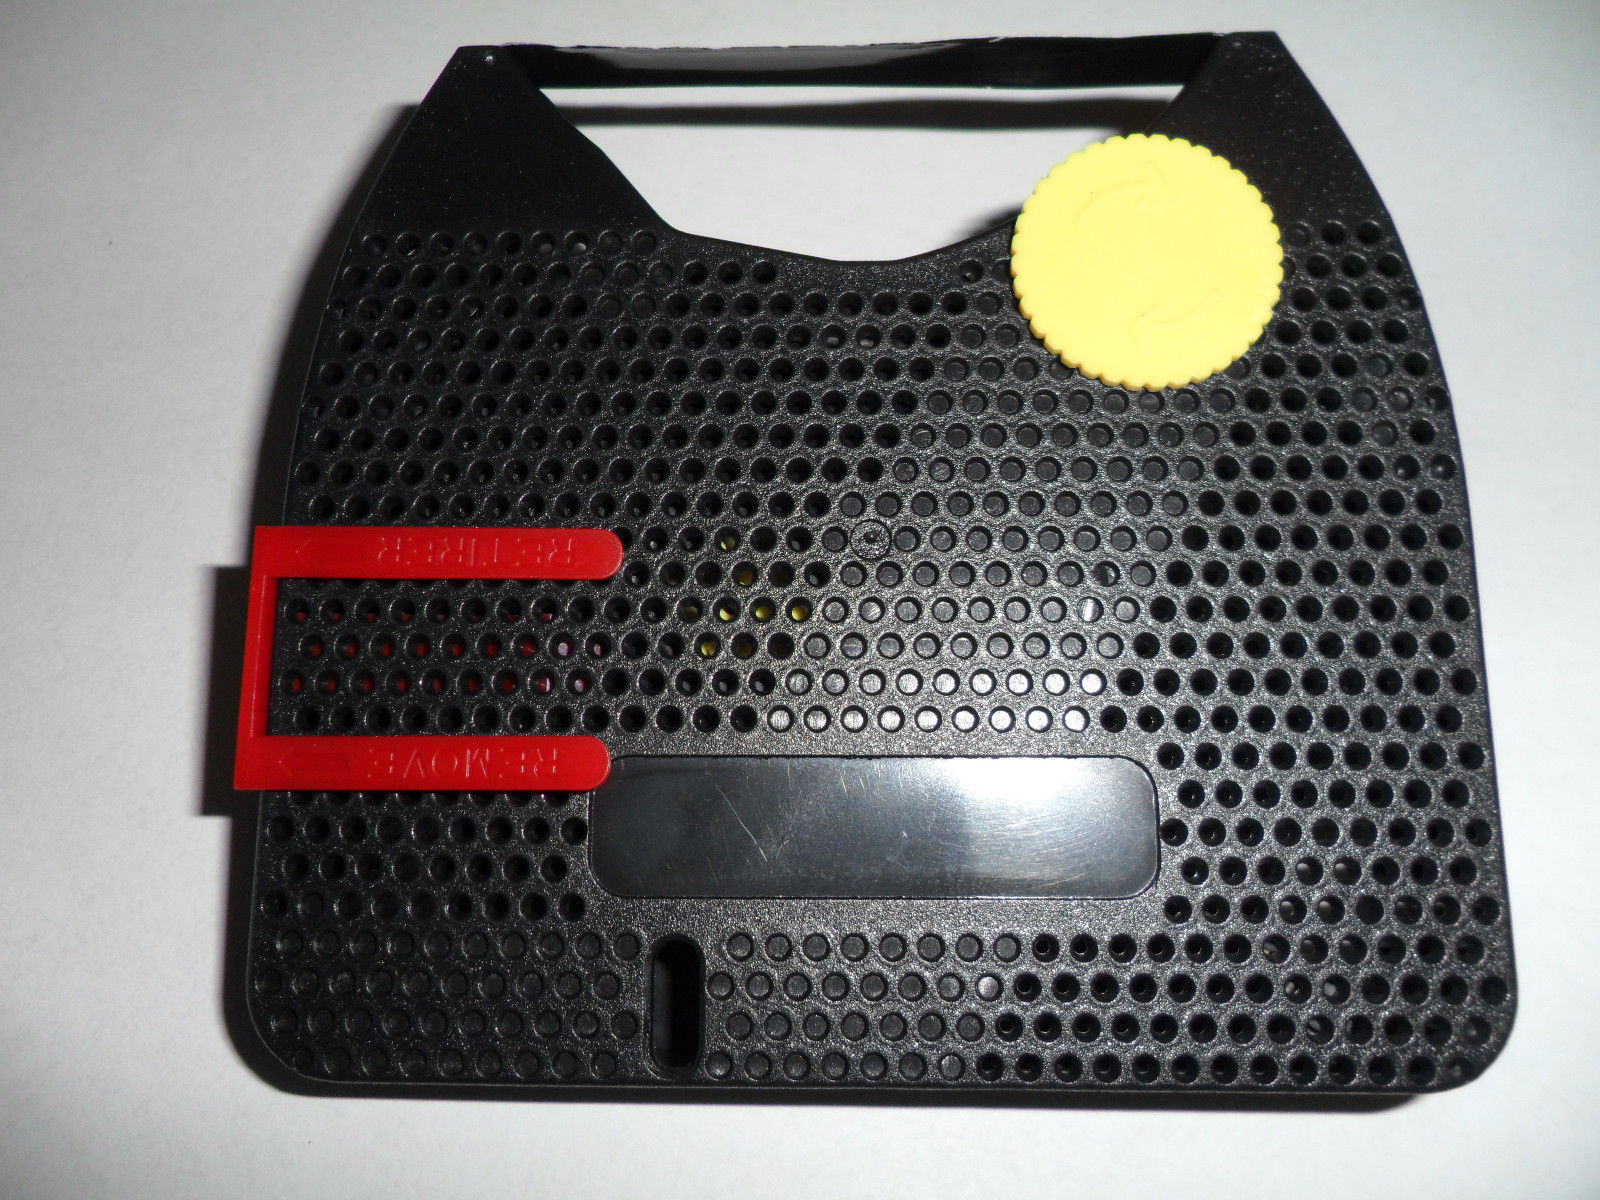 Smith Corona Mark 290 Mark 300 Typewriter Ribbon (2 Pack) Replaces 21000